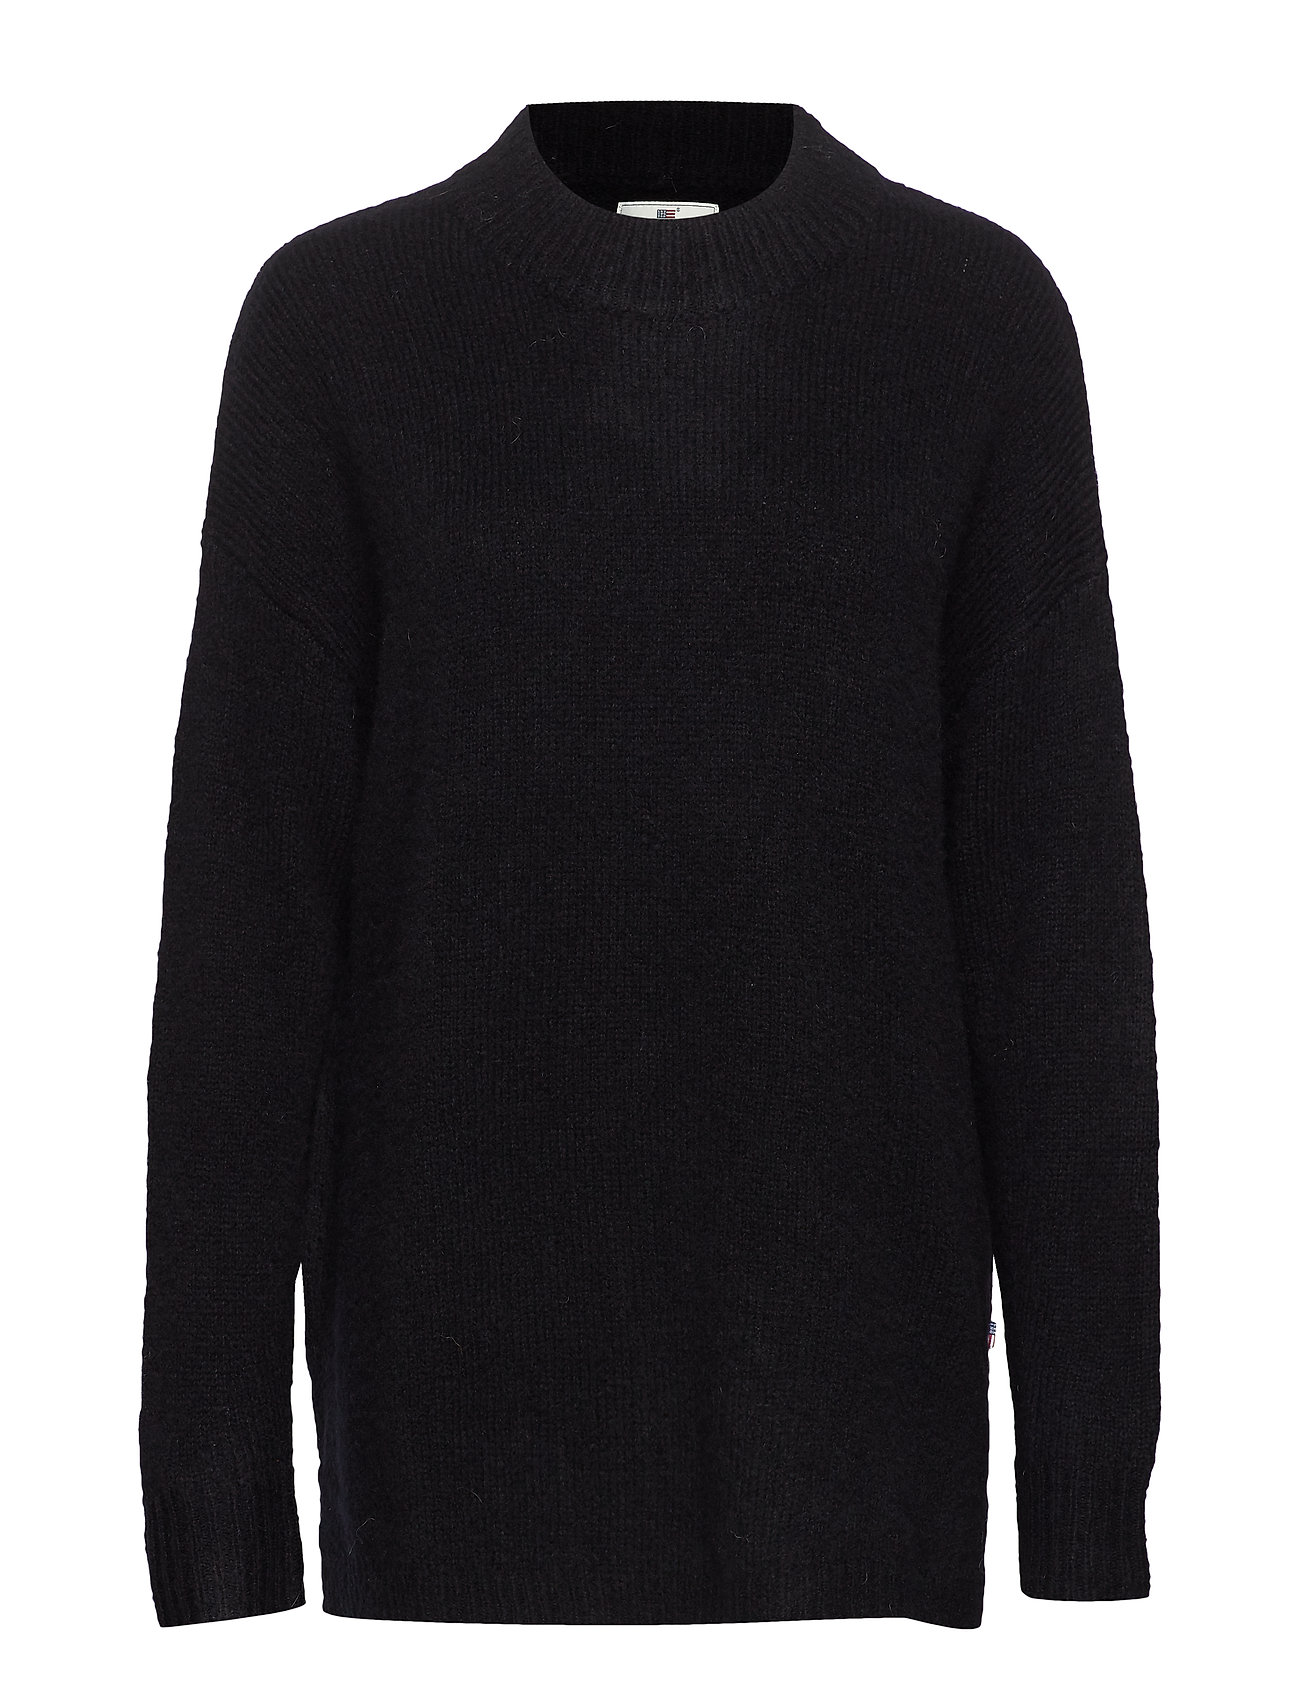 Talula BlackLexington Clothing Sweatercaviar BlackLexington Sweatercaviar Clothing Talula Sweatercaviar Talula WroCexBd